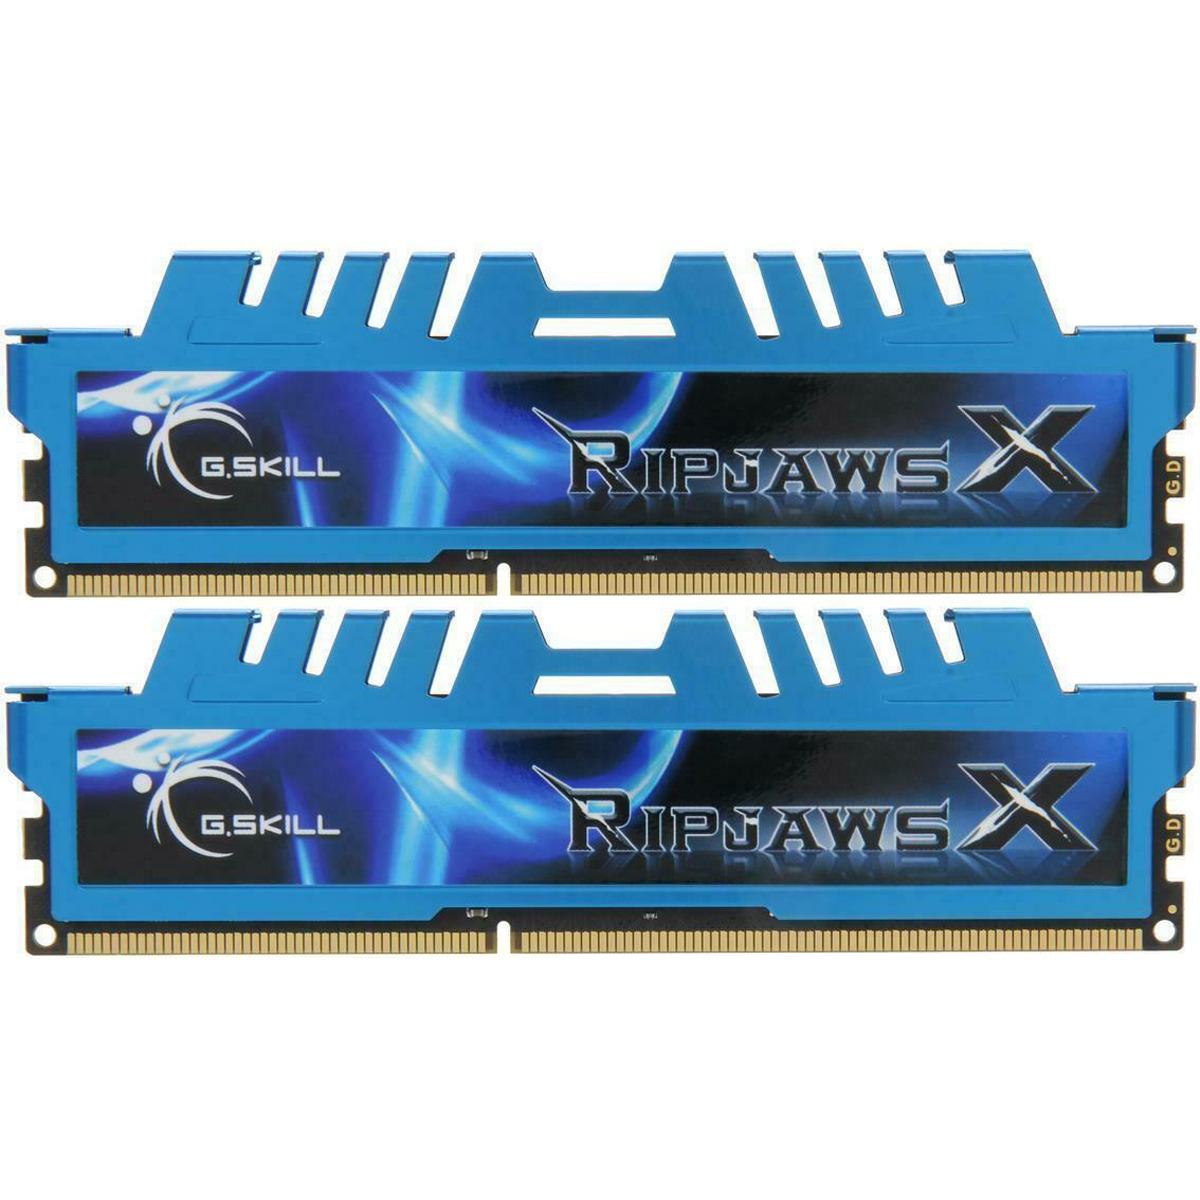 G.Skill Ripjaws X 16GB 32GB KIT PC3-14900U DDR3 1866Mhz 240Pin Memory Ram blue. Buy it now for 59.99